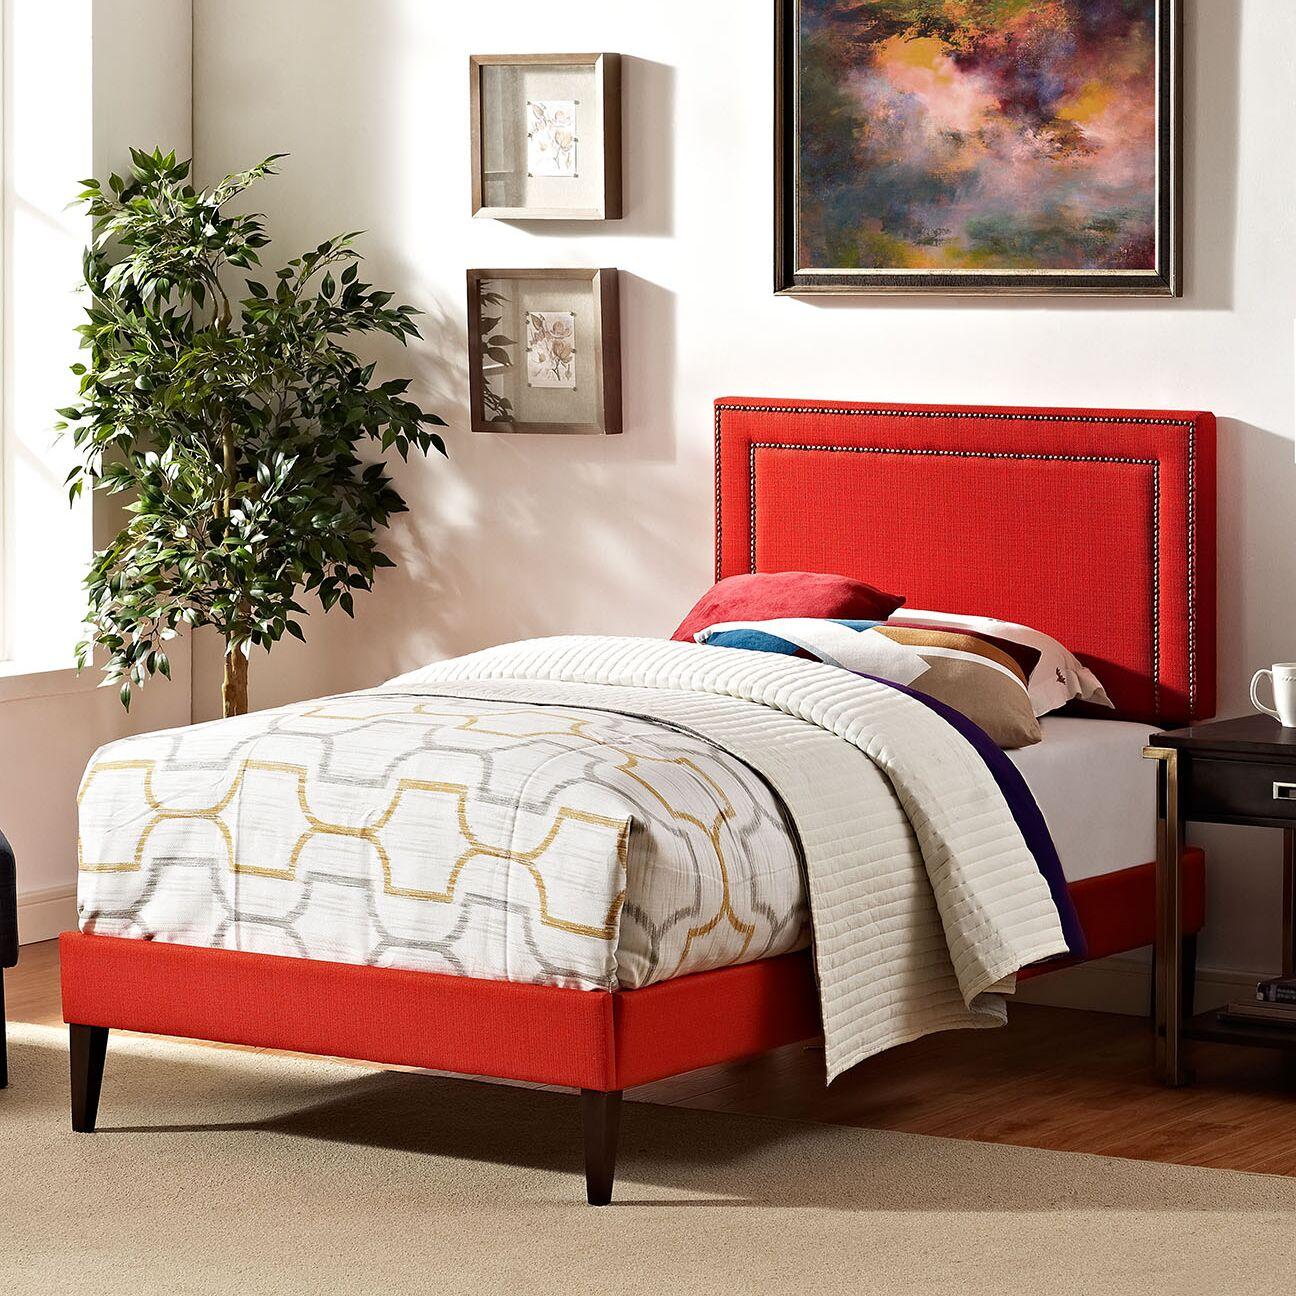 Eyre Upholstered Platform Bed Size: Twin, Color: Atomic Red